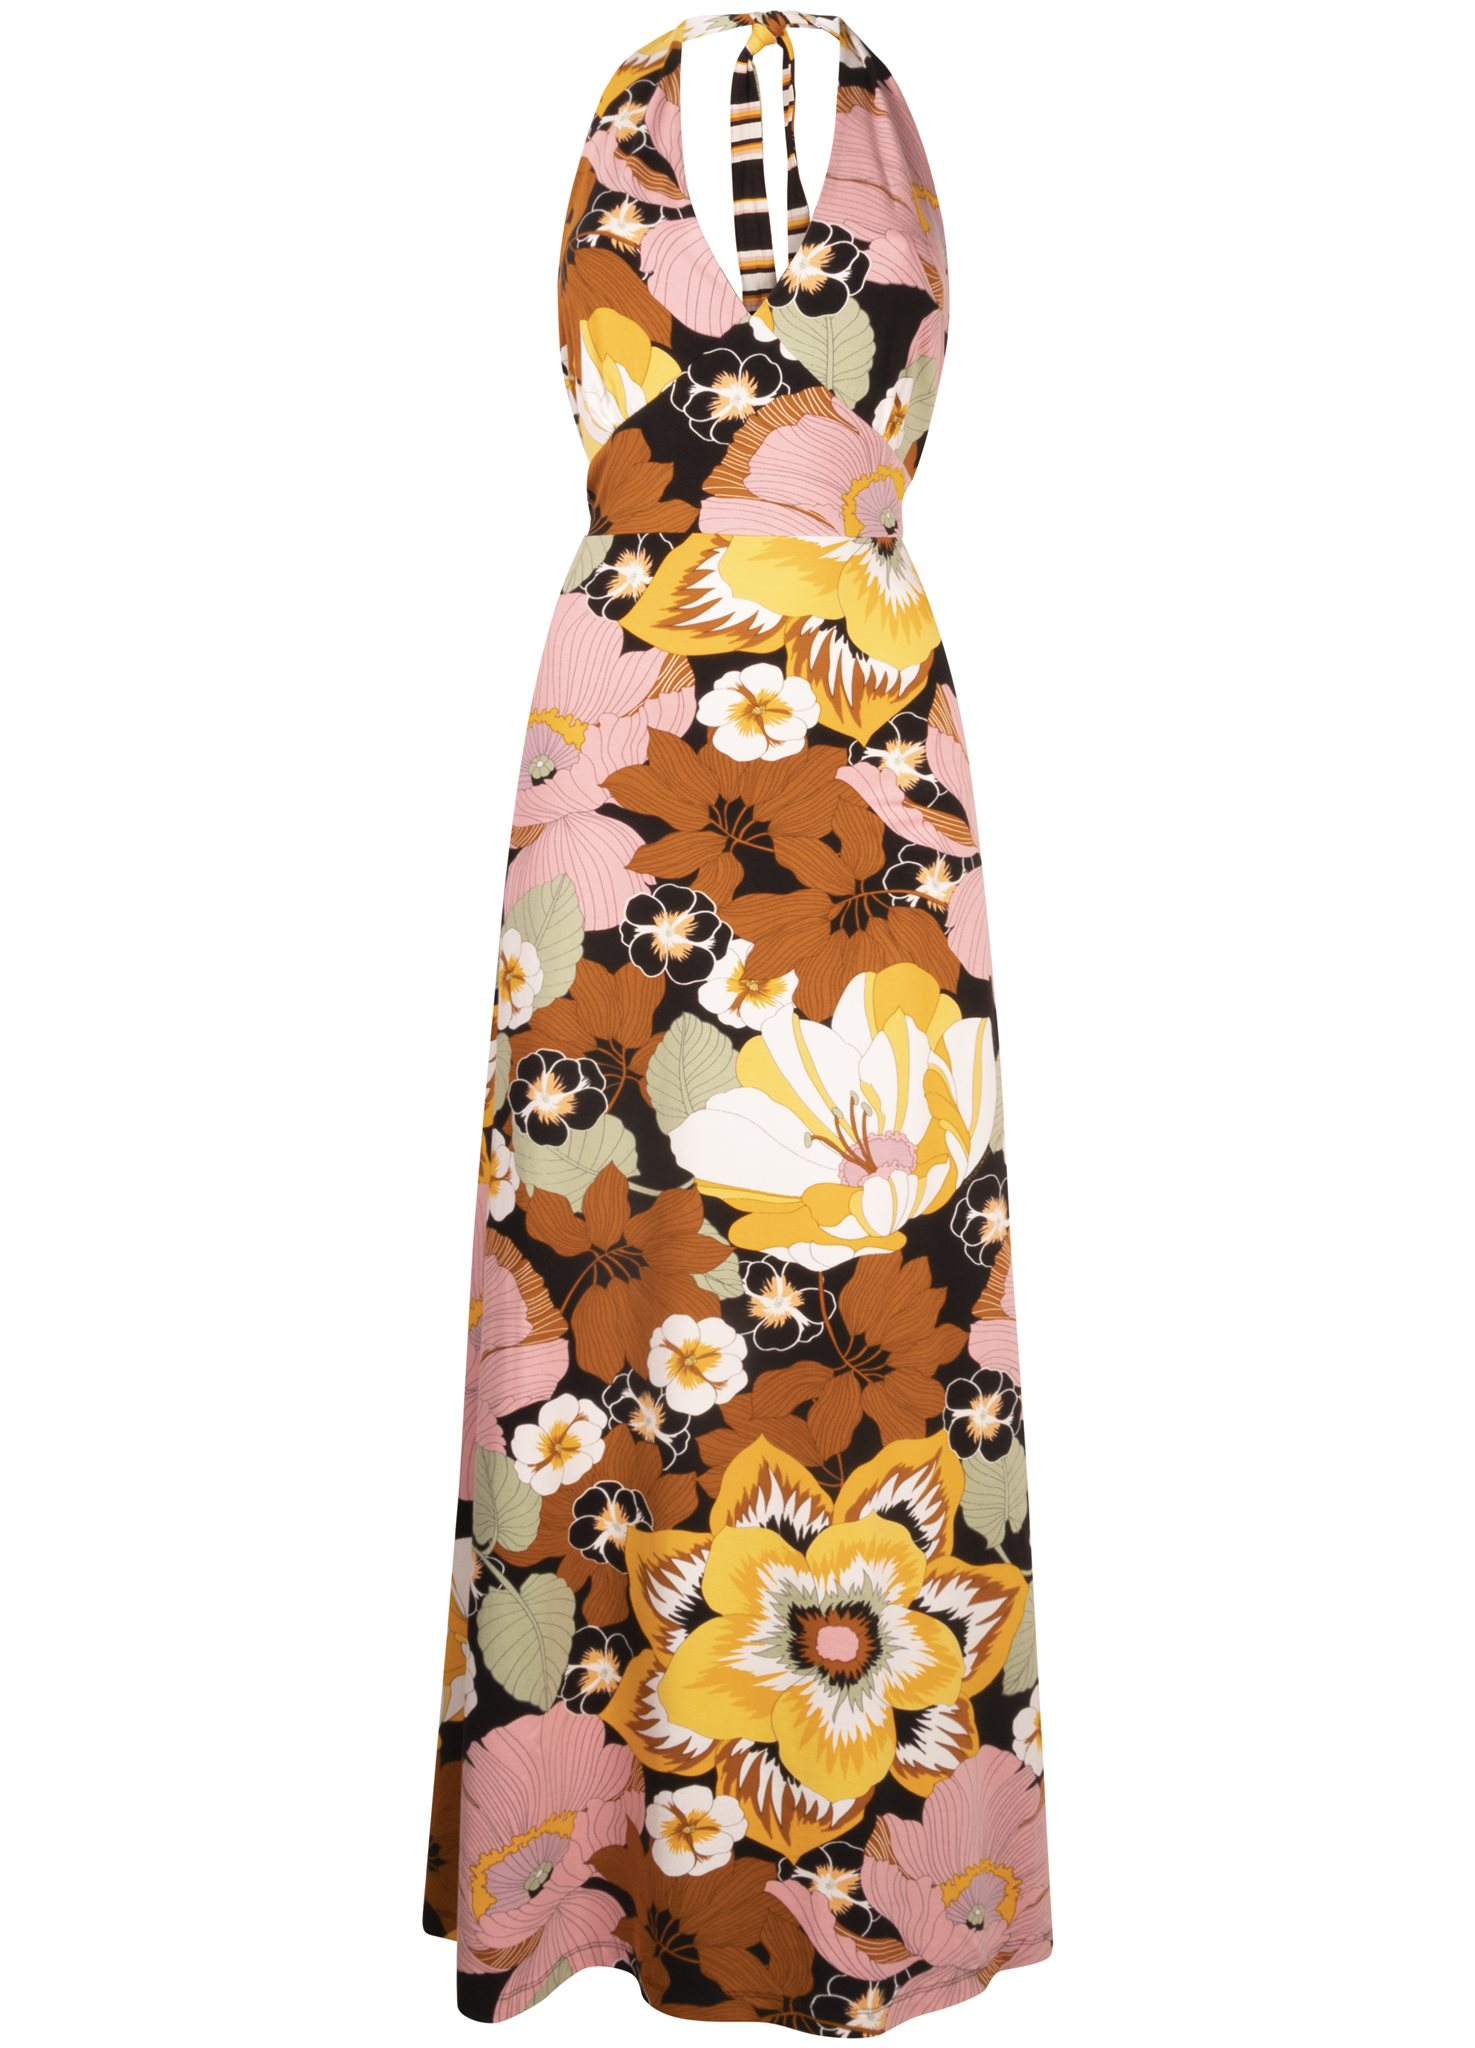 Dress Halter Blooming Print